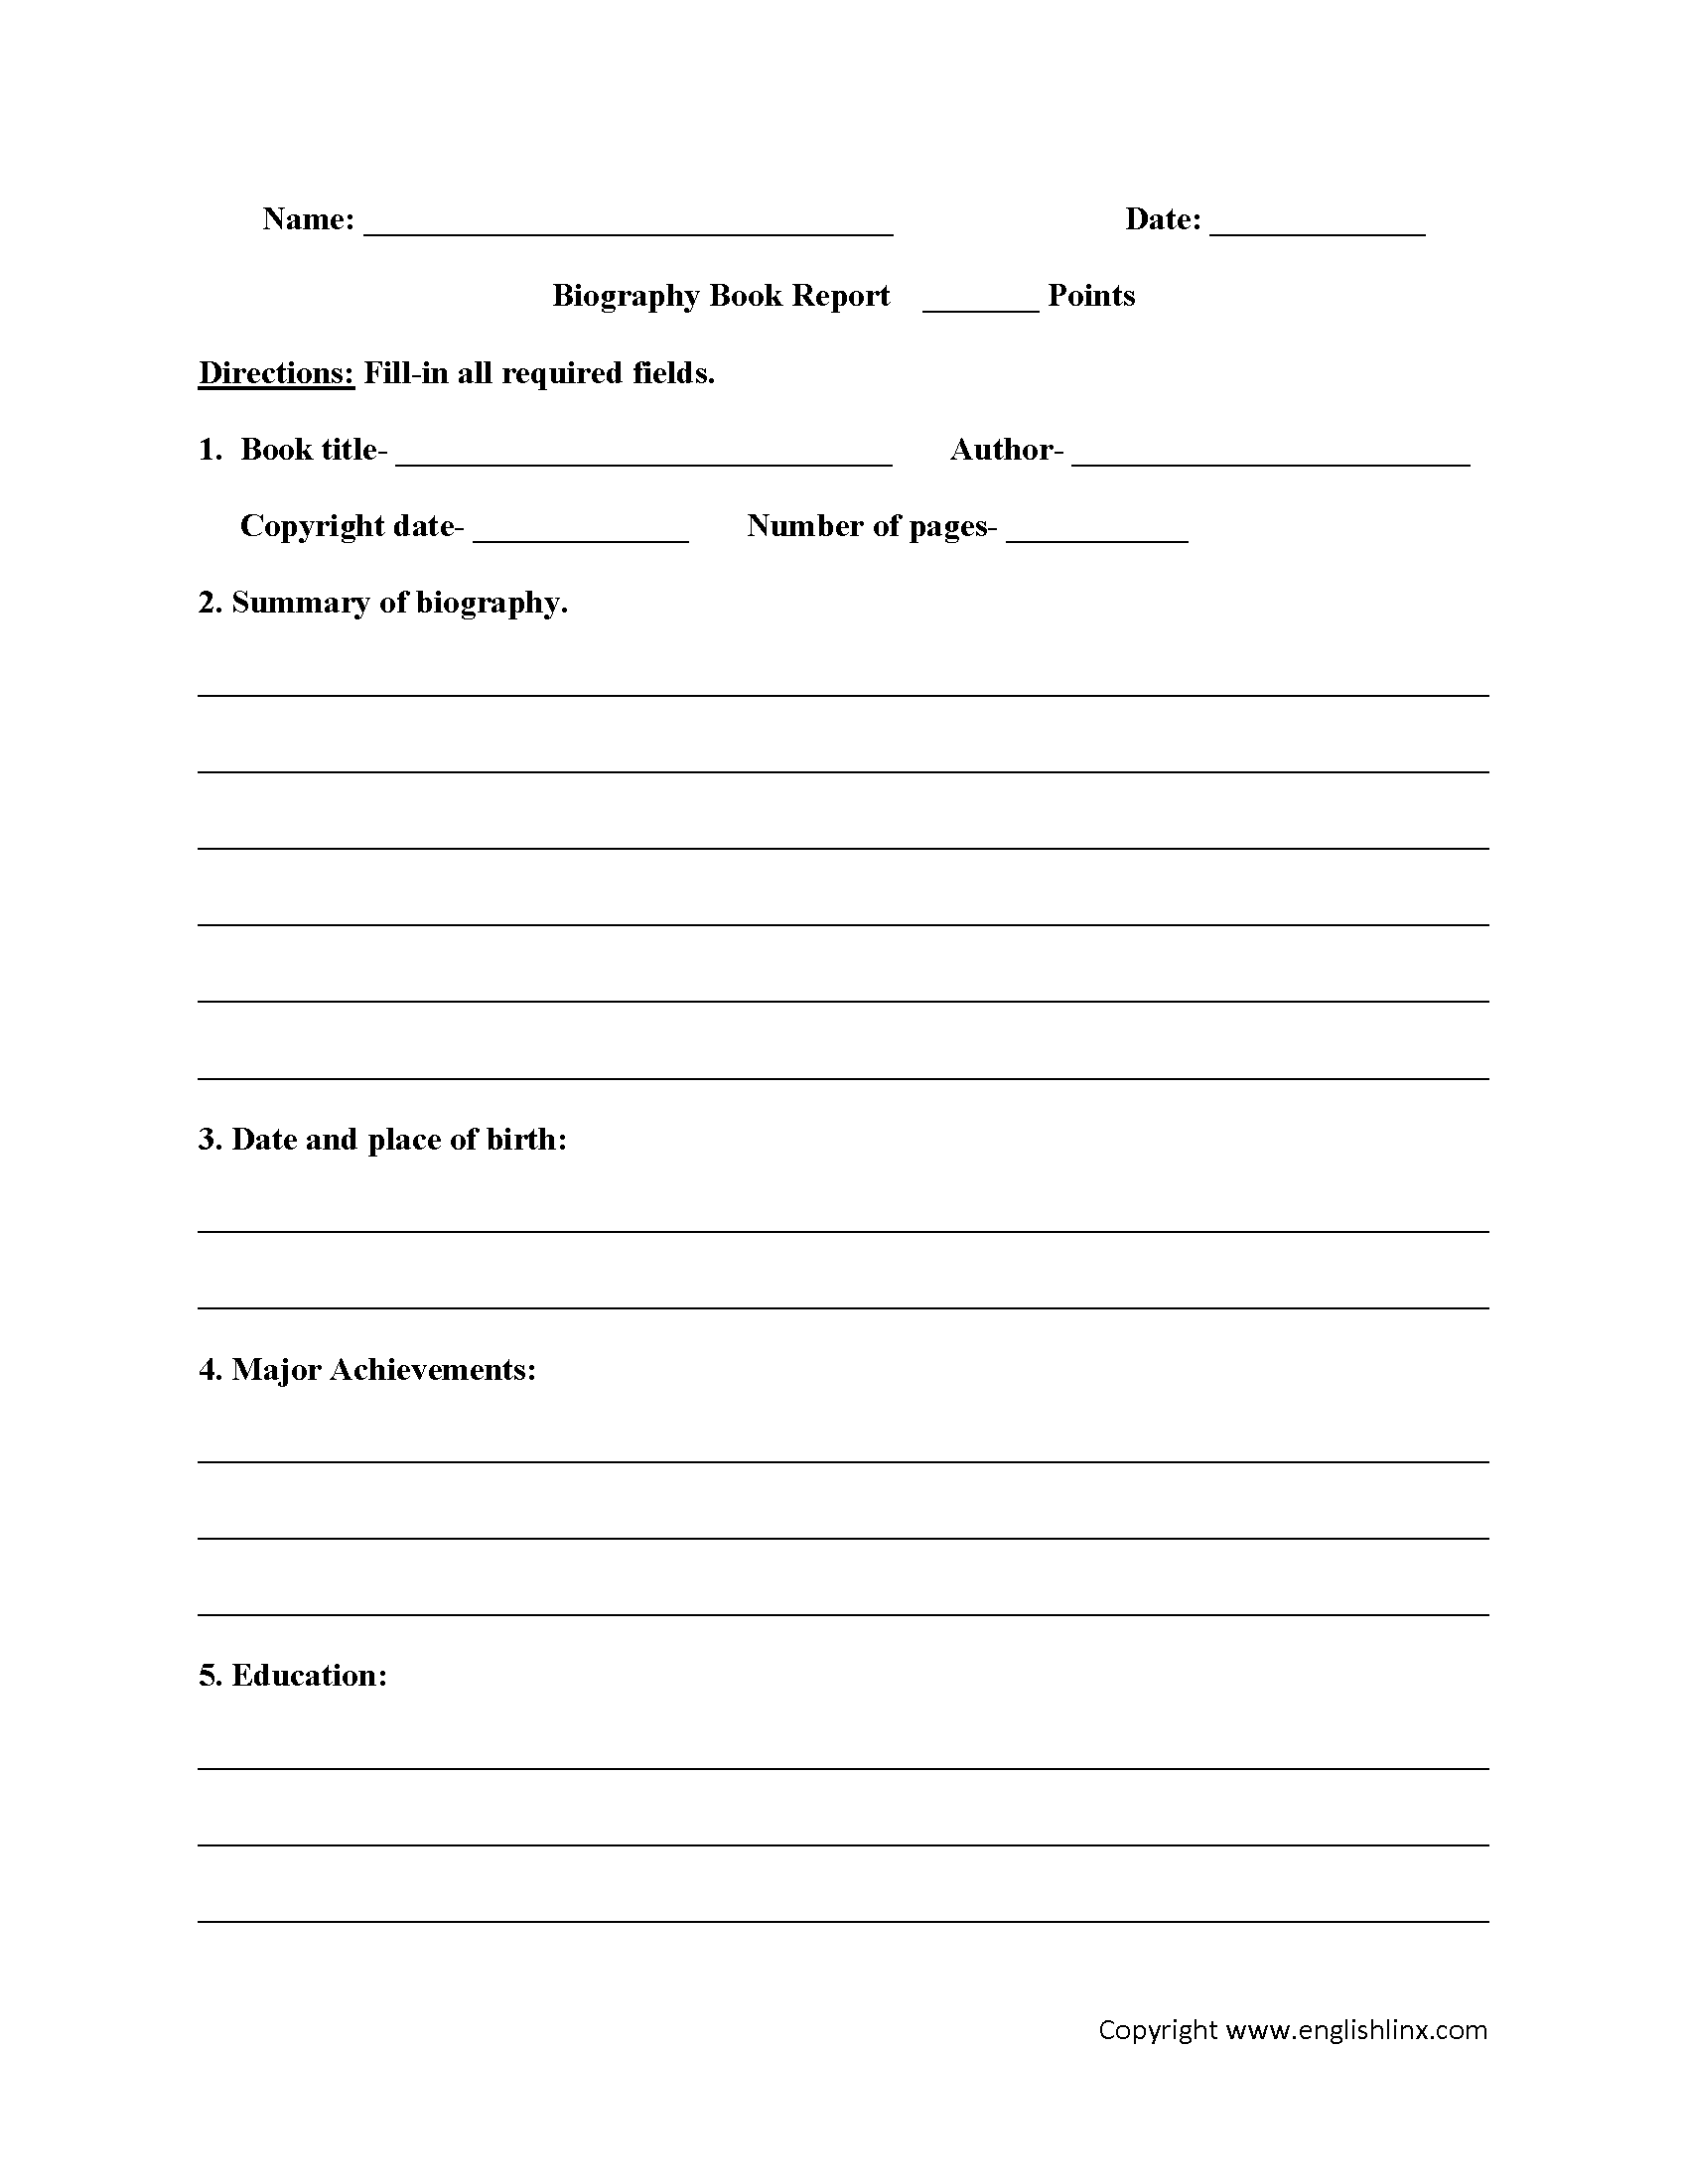 Biography Worksheet For 5th Grade